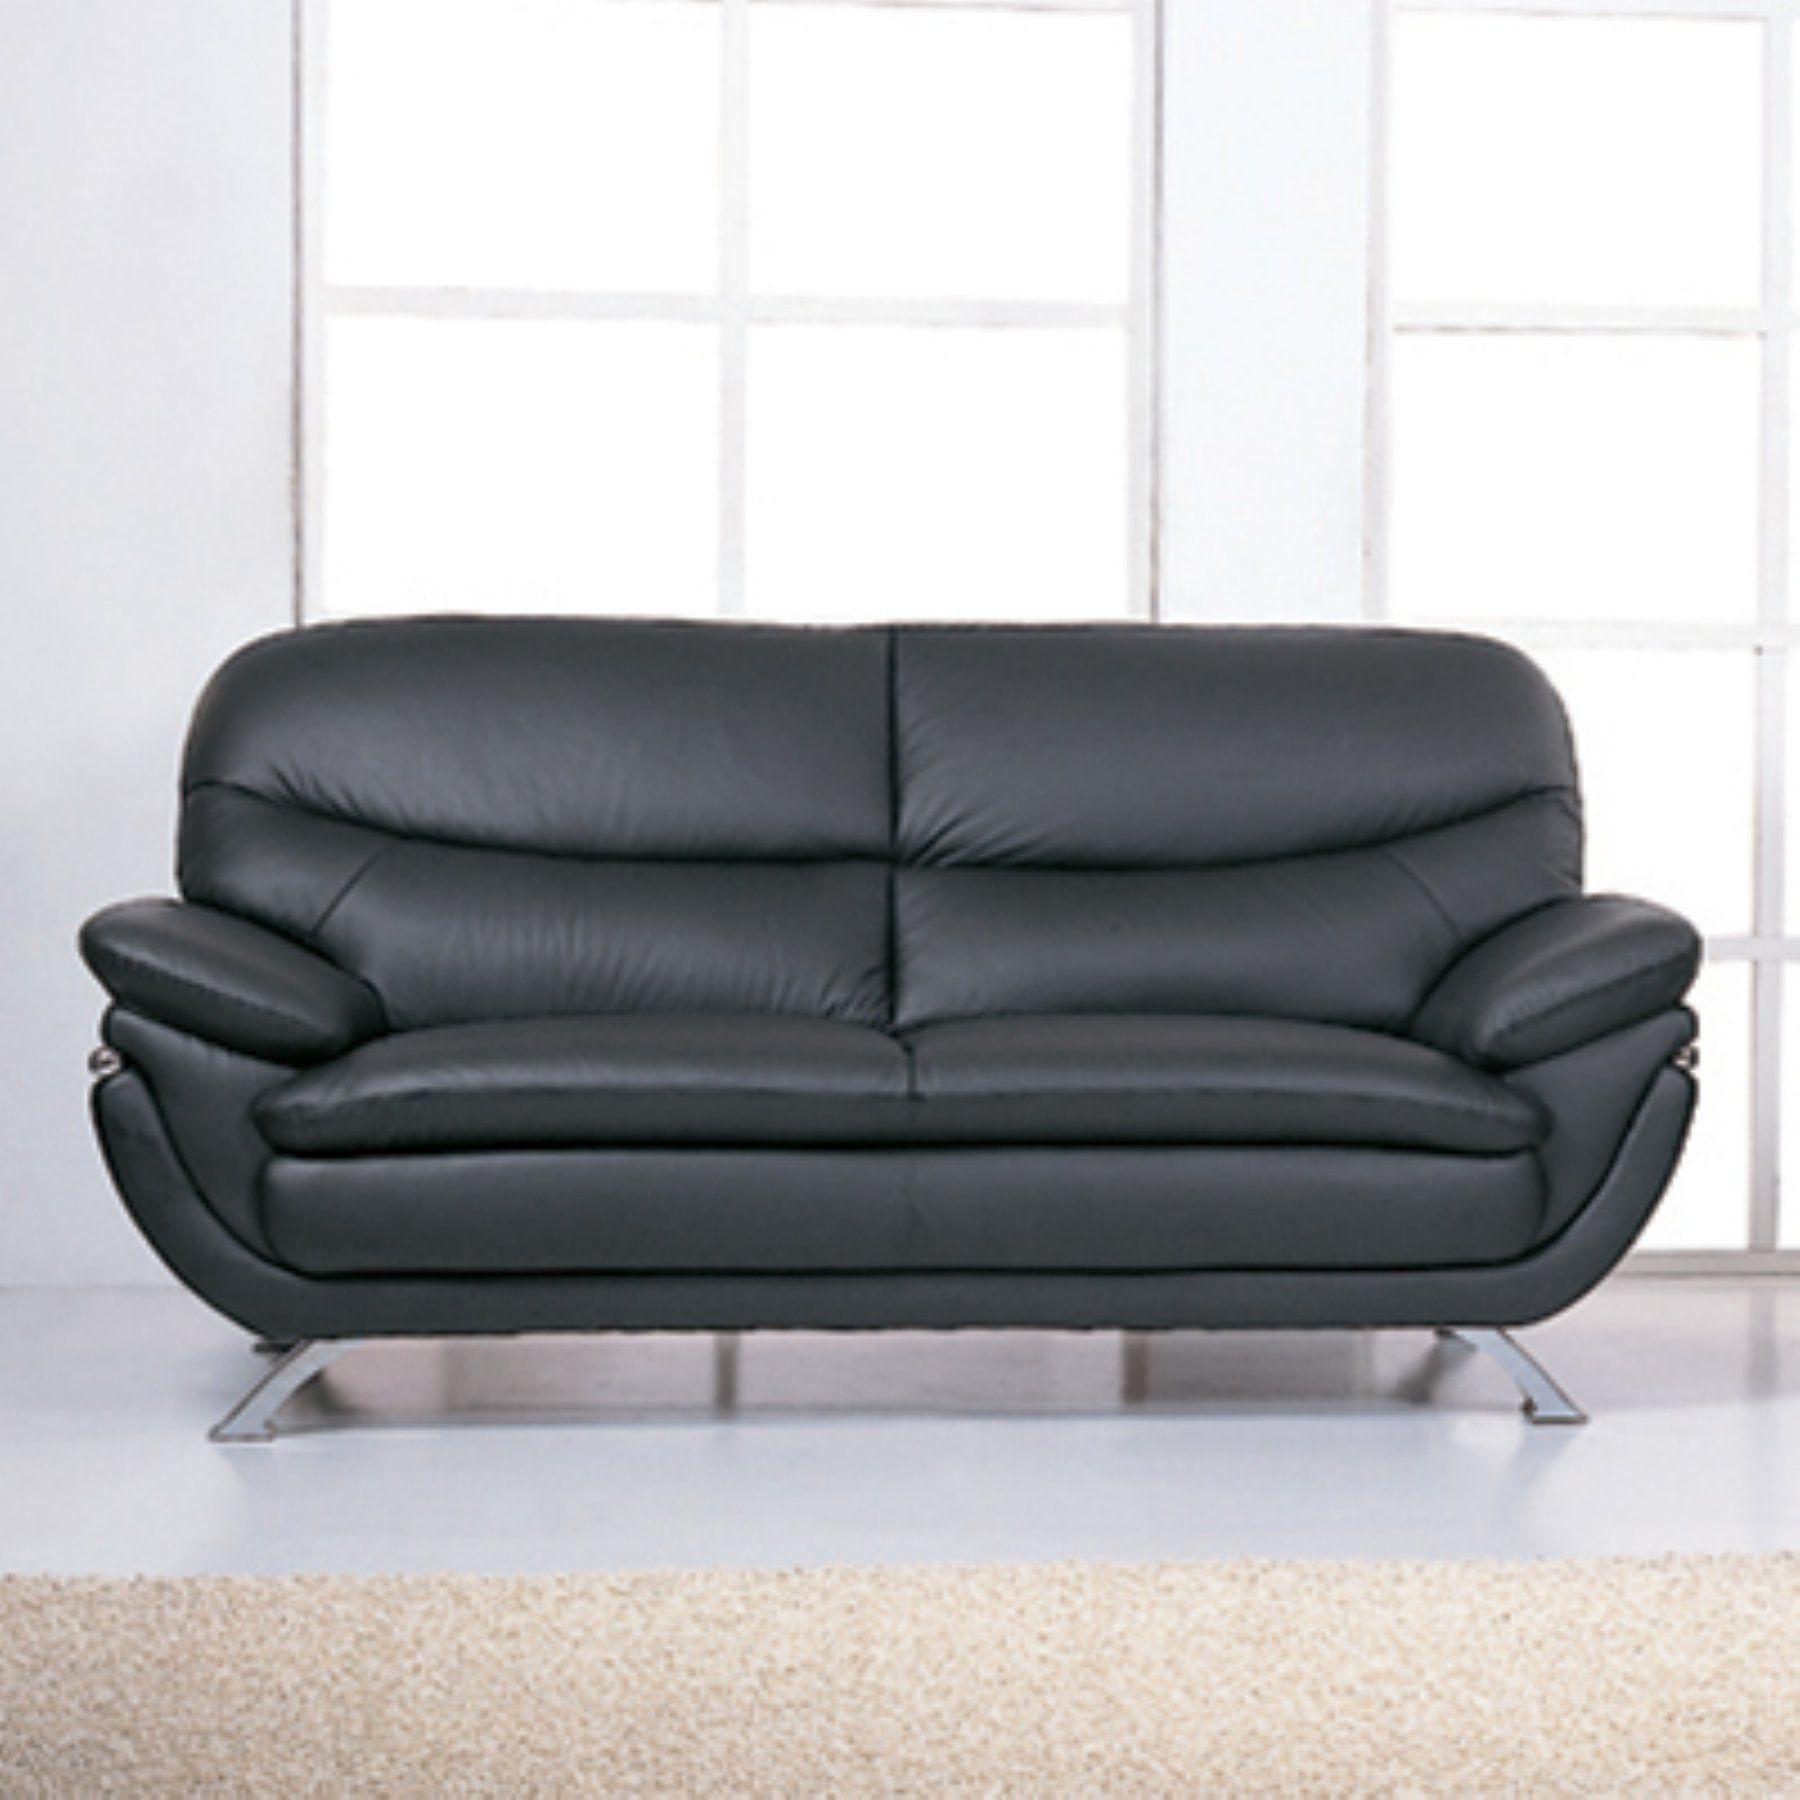 King Cloud III Recliner Sofa Luxurious reclining sofa